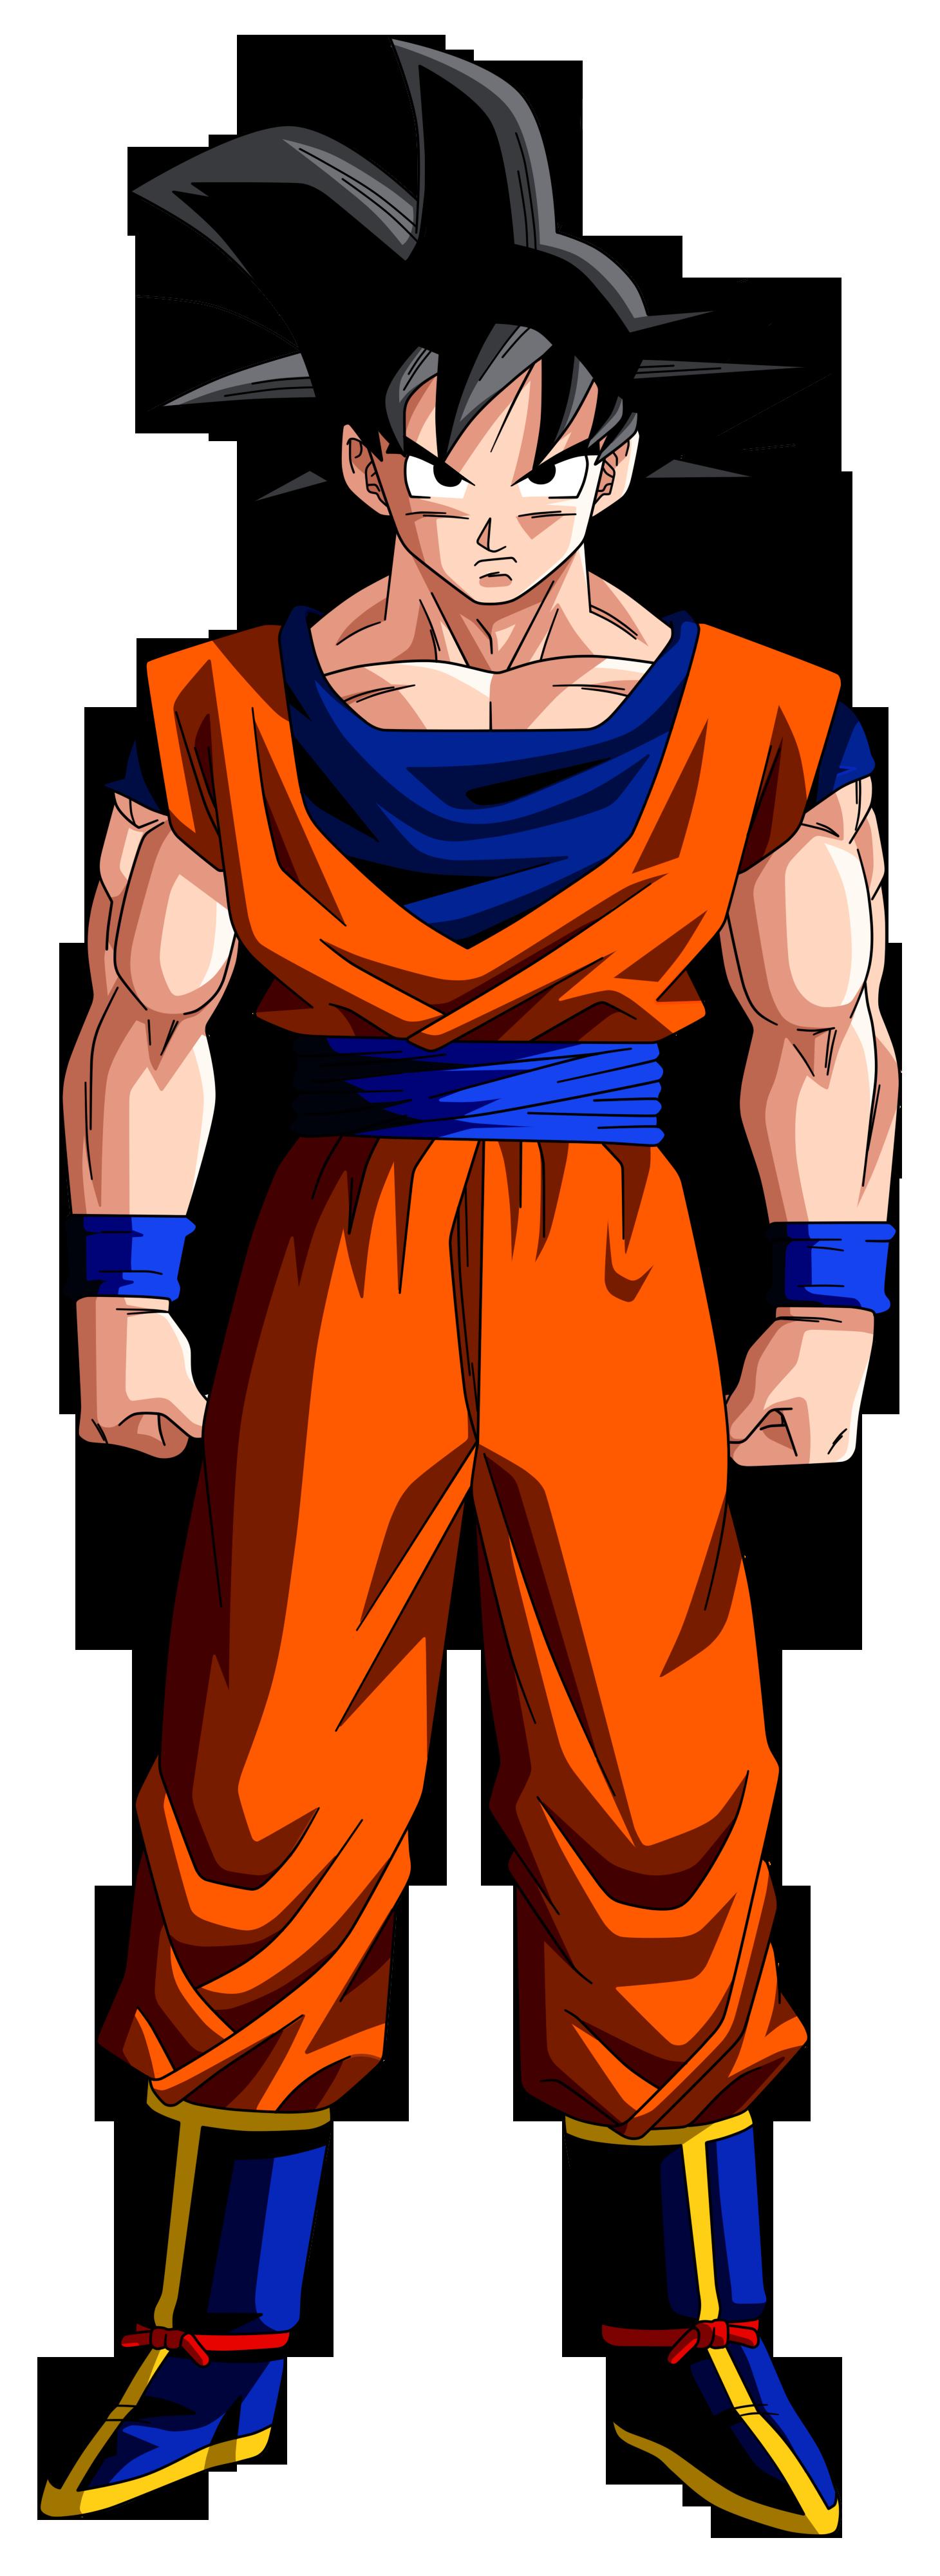 Goku (LordPanda)   Dragonball Fanon Wiki   FANDOM powered by Wikia